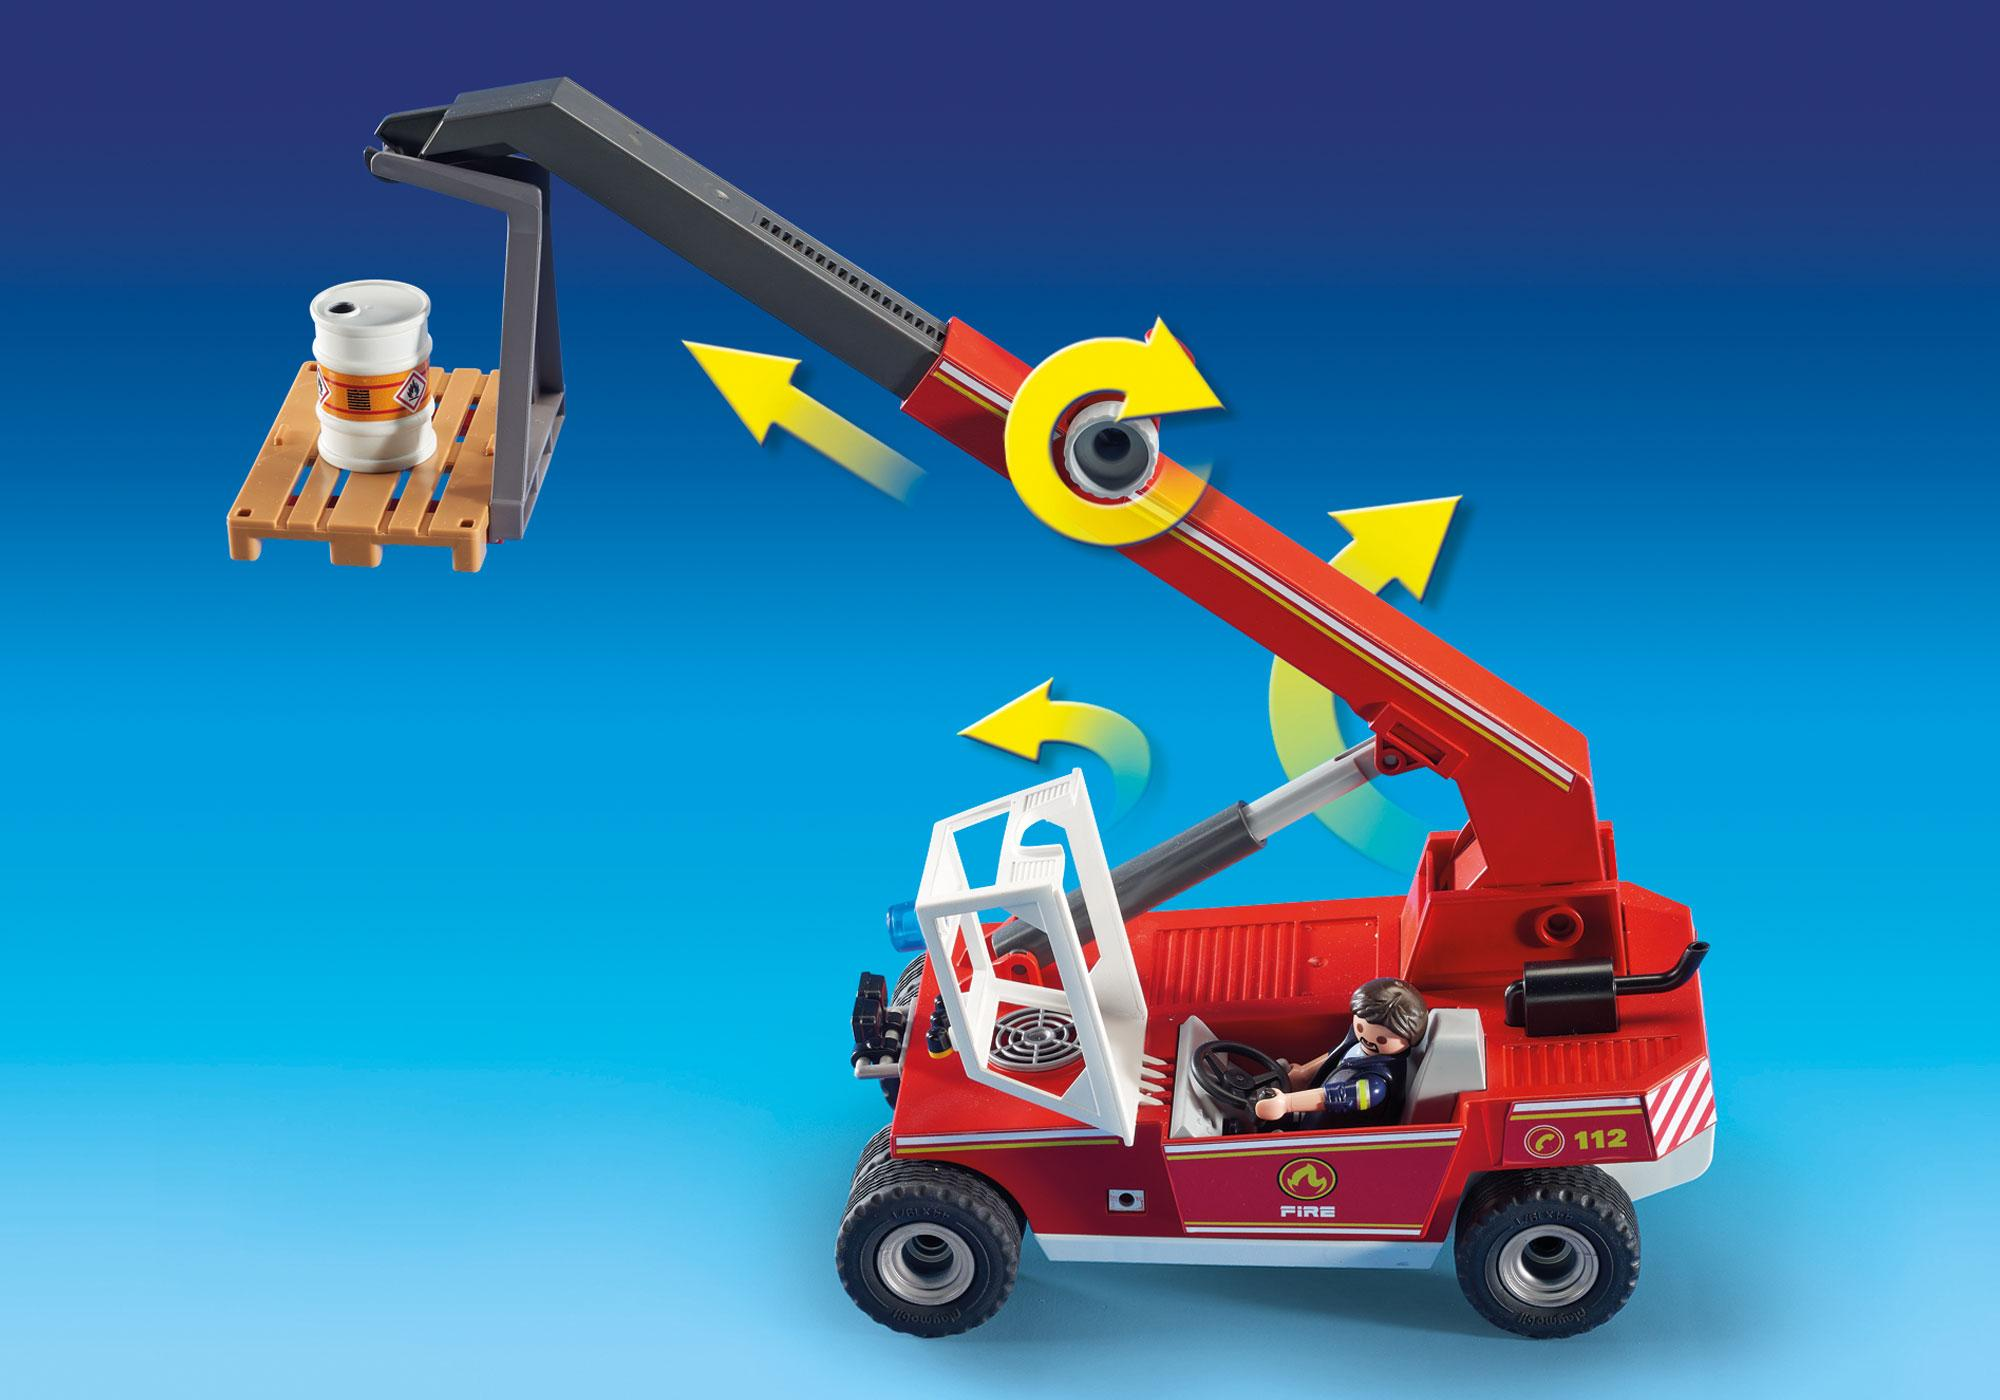 http://media.playmobil.com/i/playmobil/9465_product_extra2/Veicolo con braccio telescopico